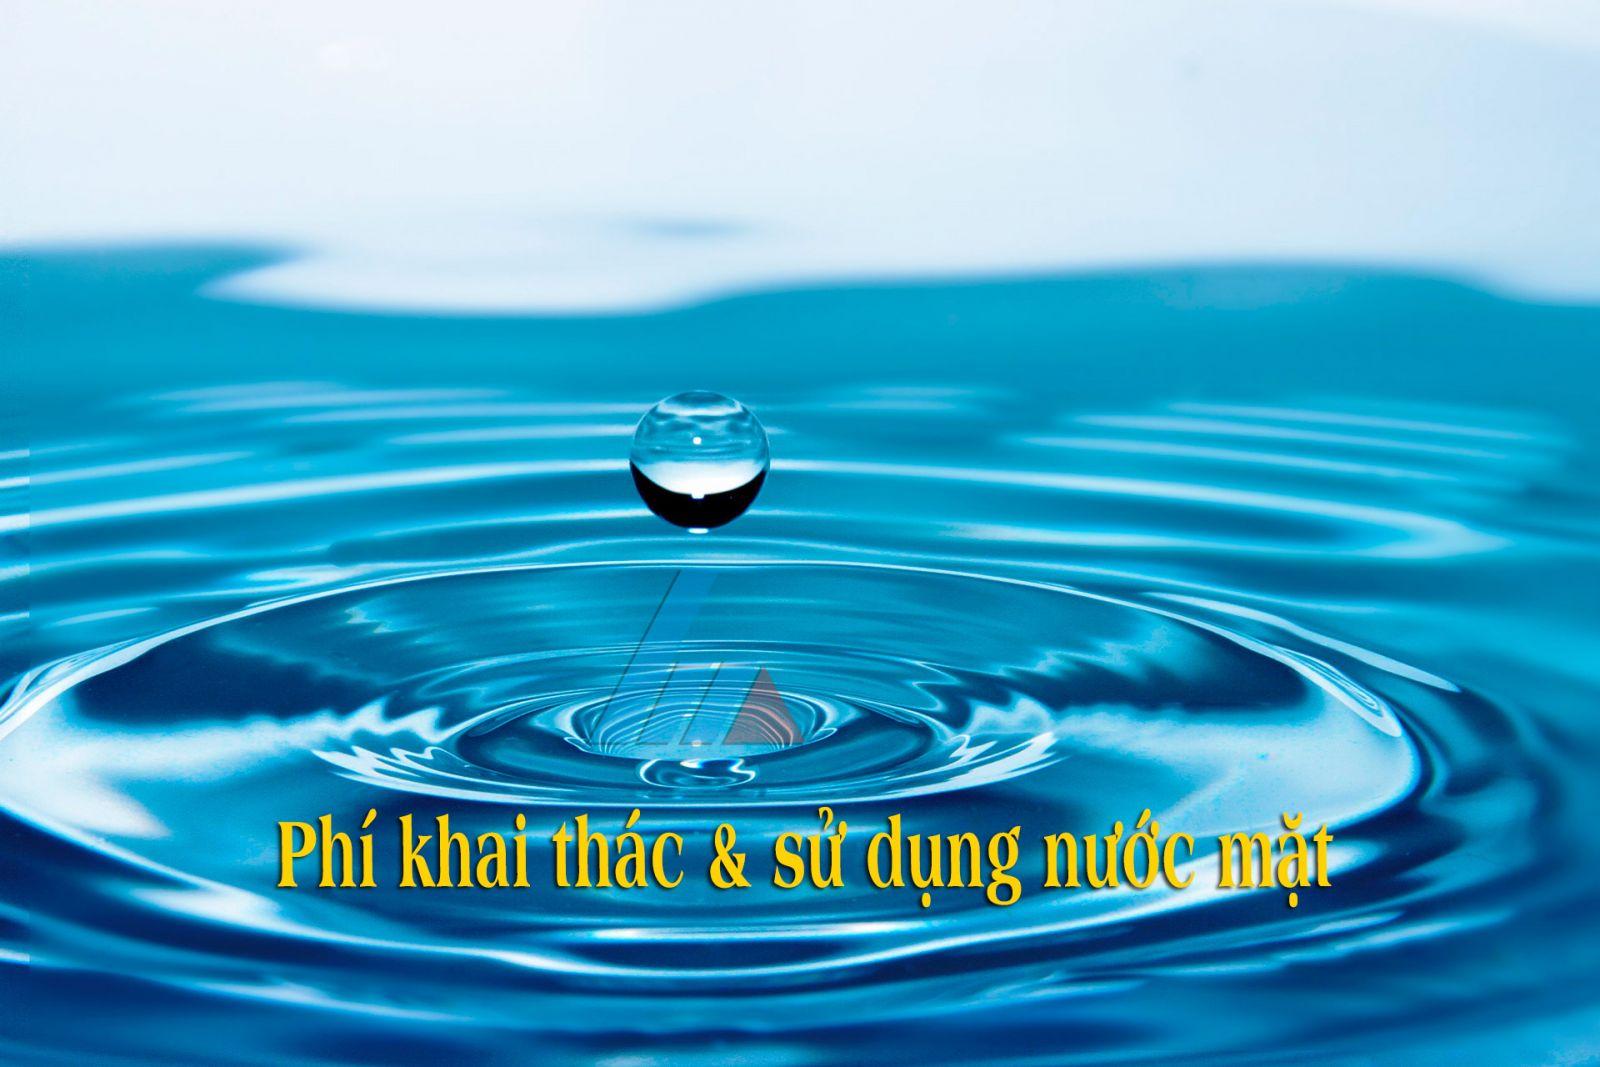 Phí khai thác nước mặt